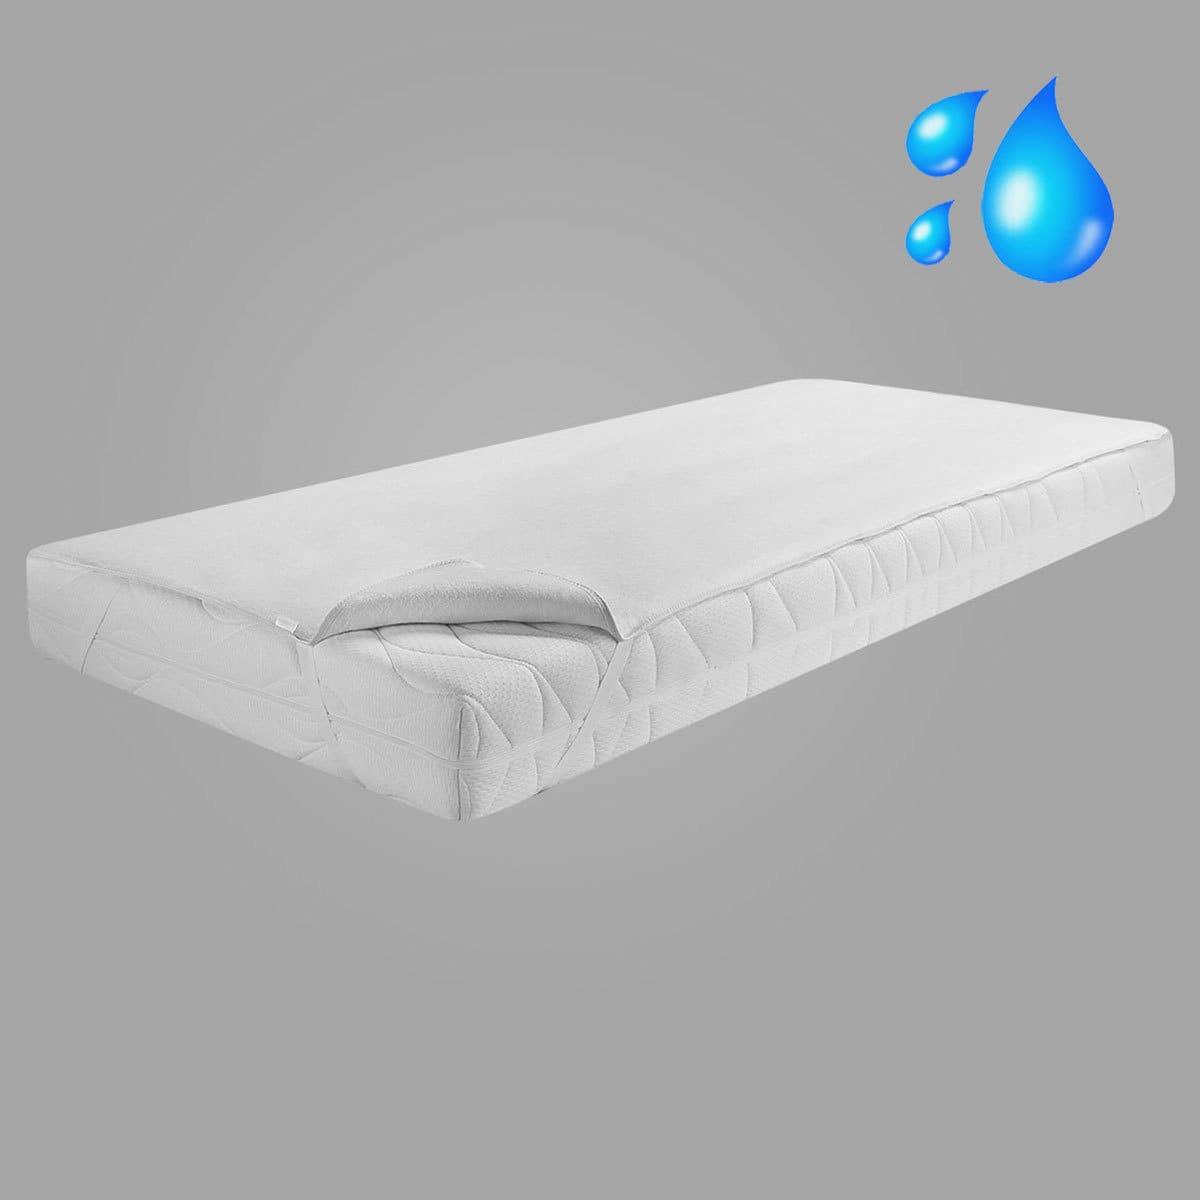 Dormisette Premium Matratzen Auflage Wasserdicht Q70